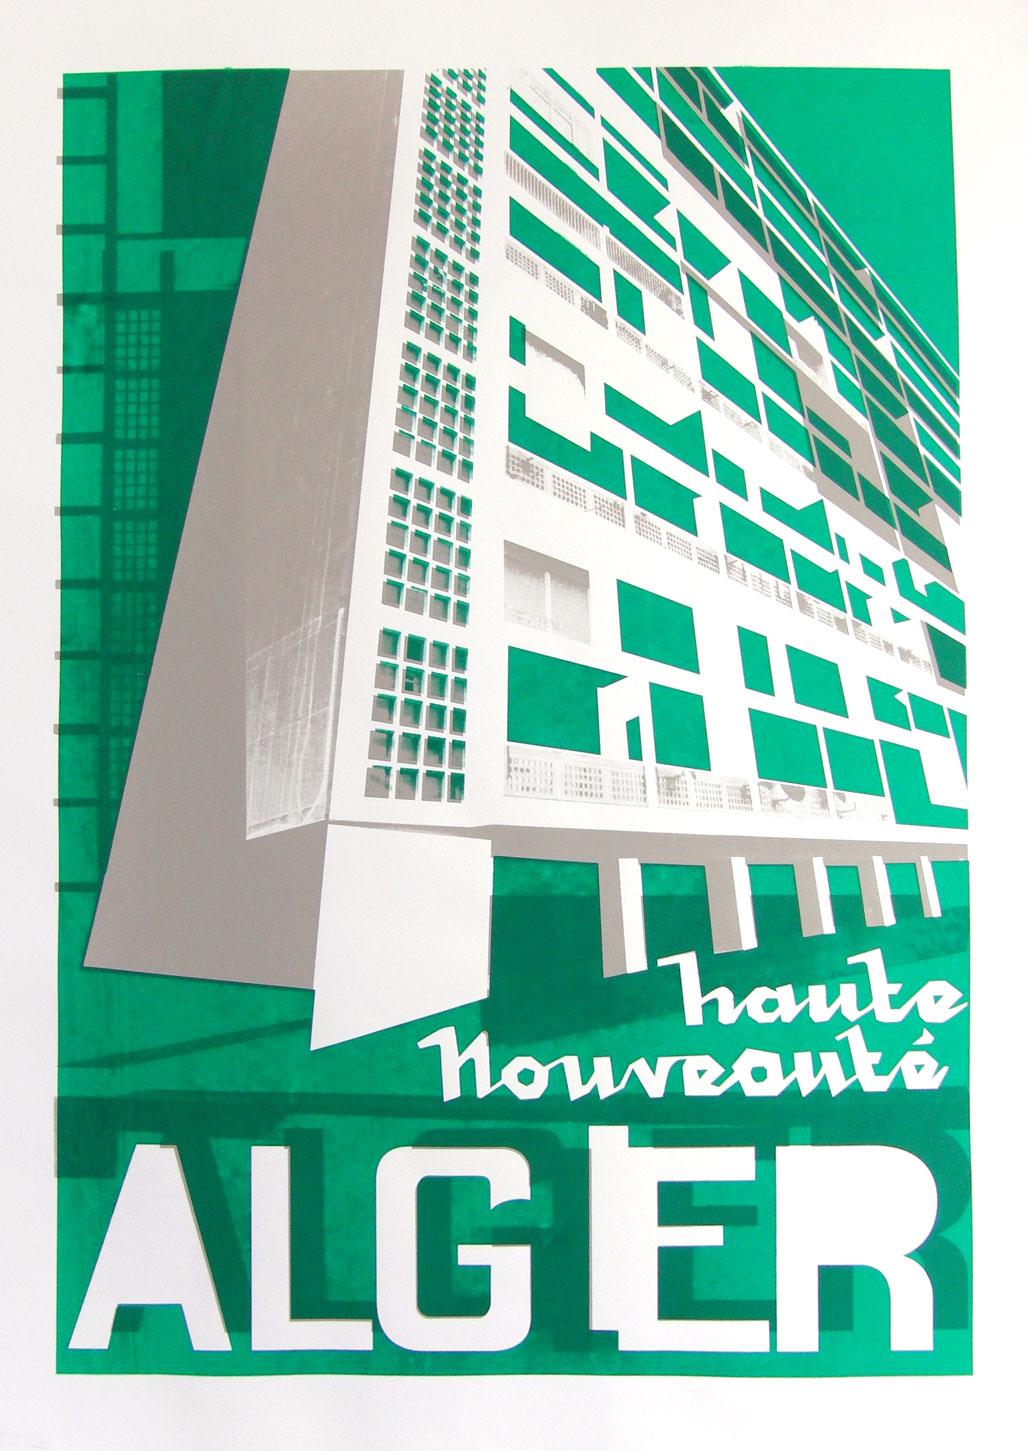 Algier_Posters_schick